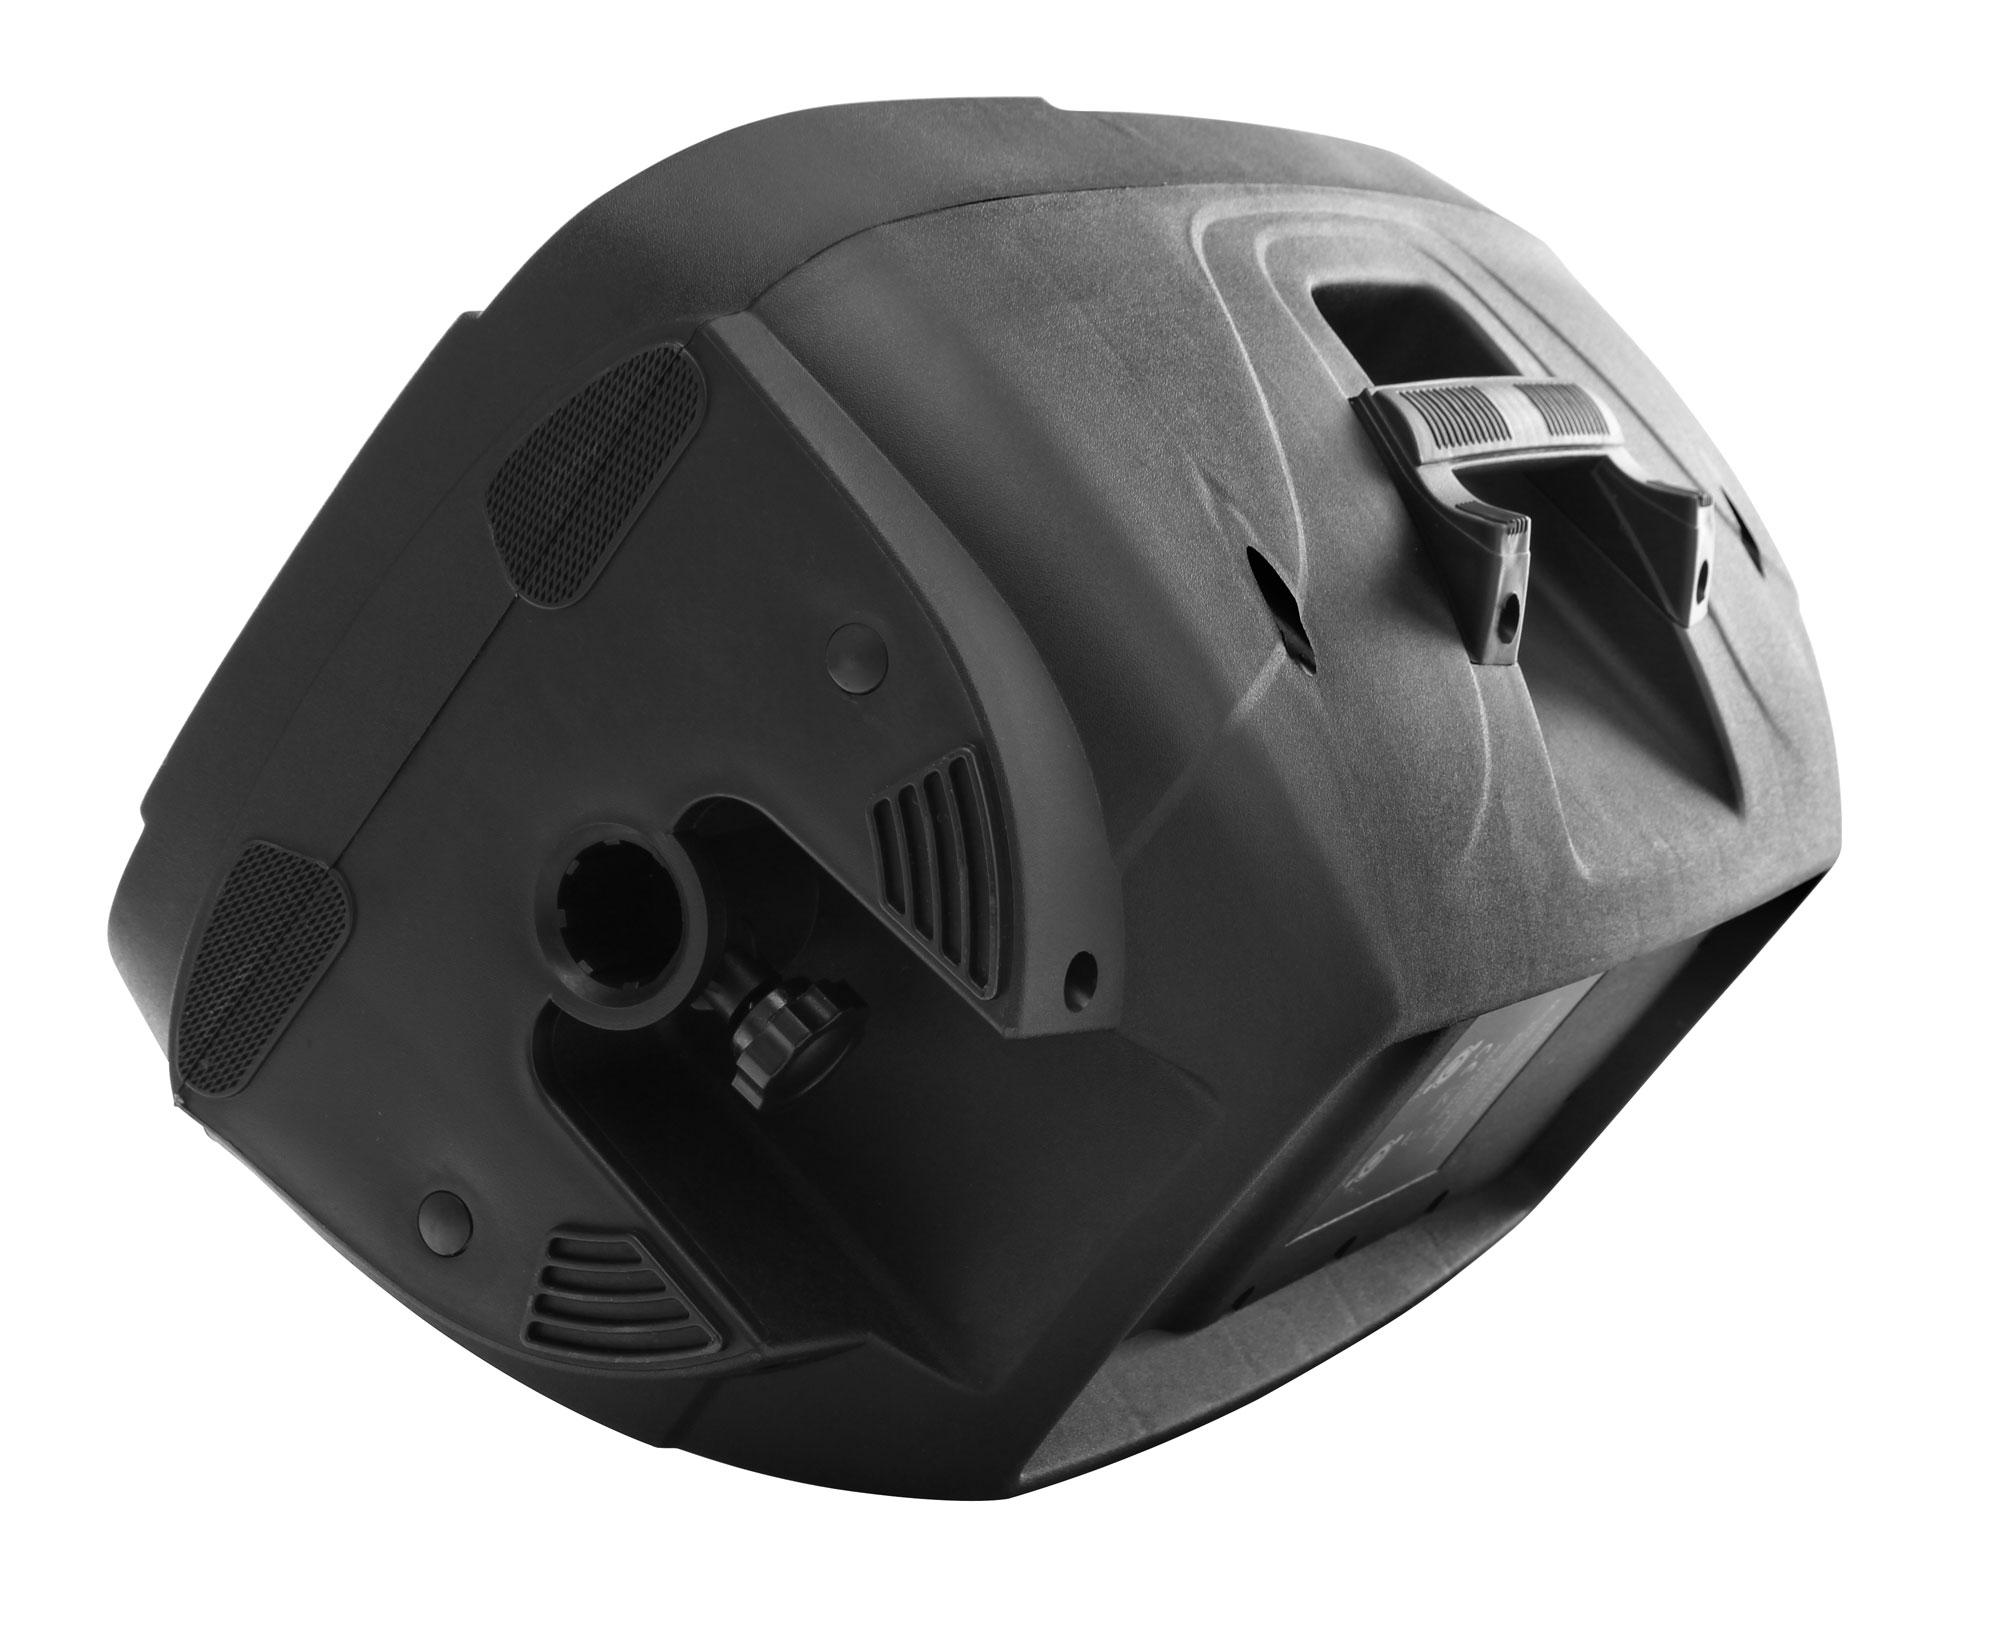 pronomic ph12a aktivbox lautsprecher mp3 bluetooth 150 300 watt. Black Bedroom Furniture Sets. Home Design Ideas